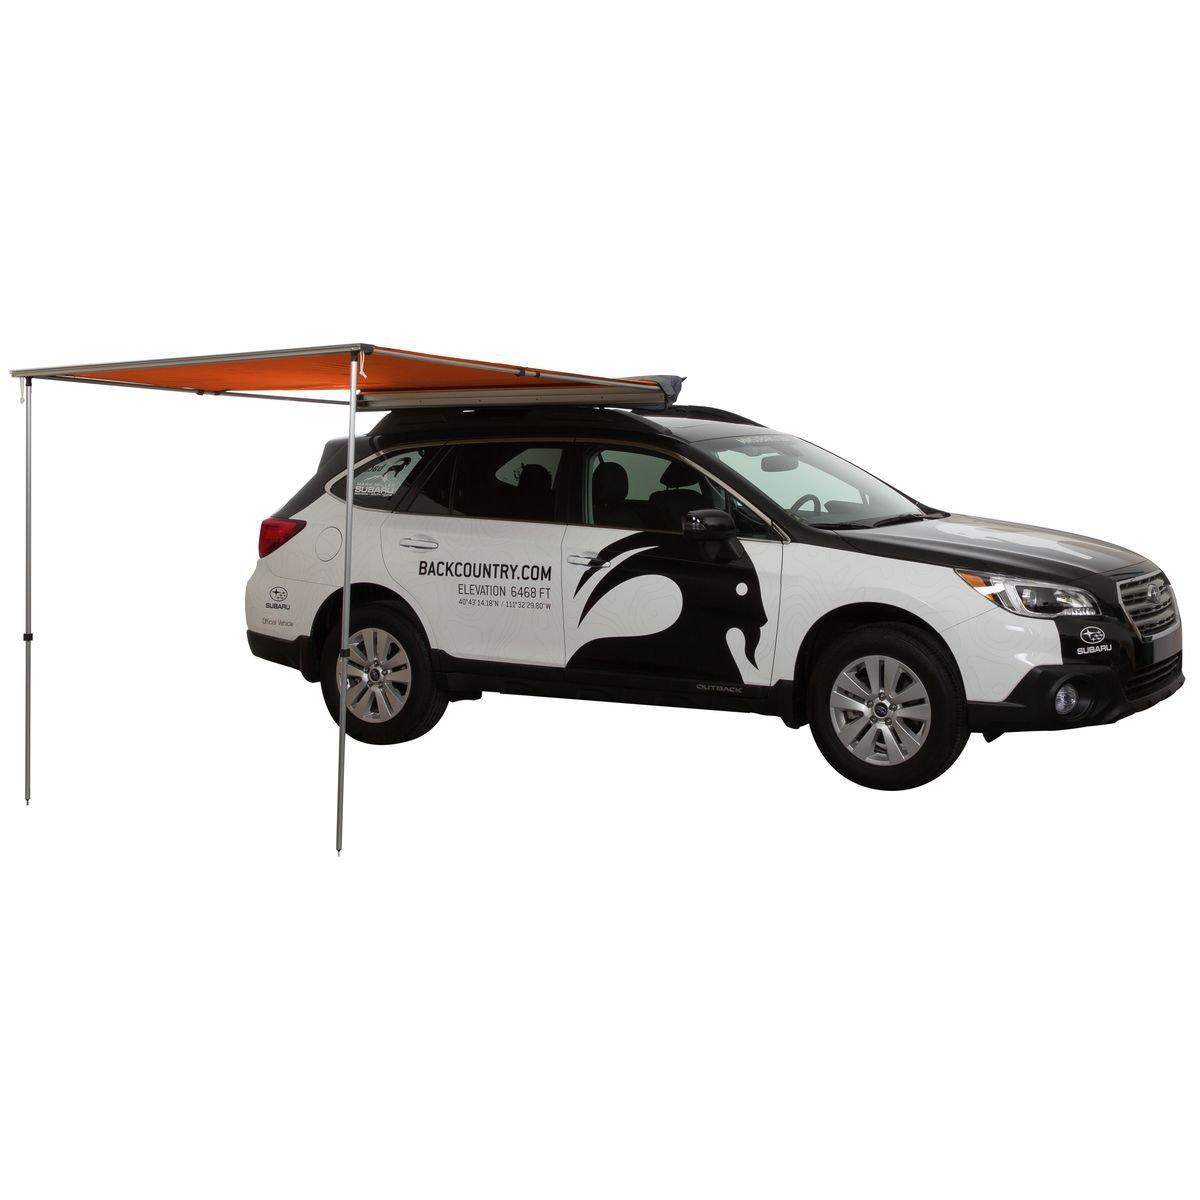 Tepuiオーニング窓 B06XX6VCPP 6ft|Orange Canopy/Black Cover Orange Canopy/Black Cover 6ft